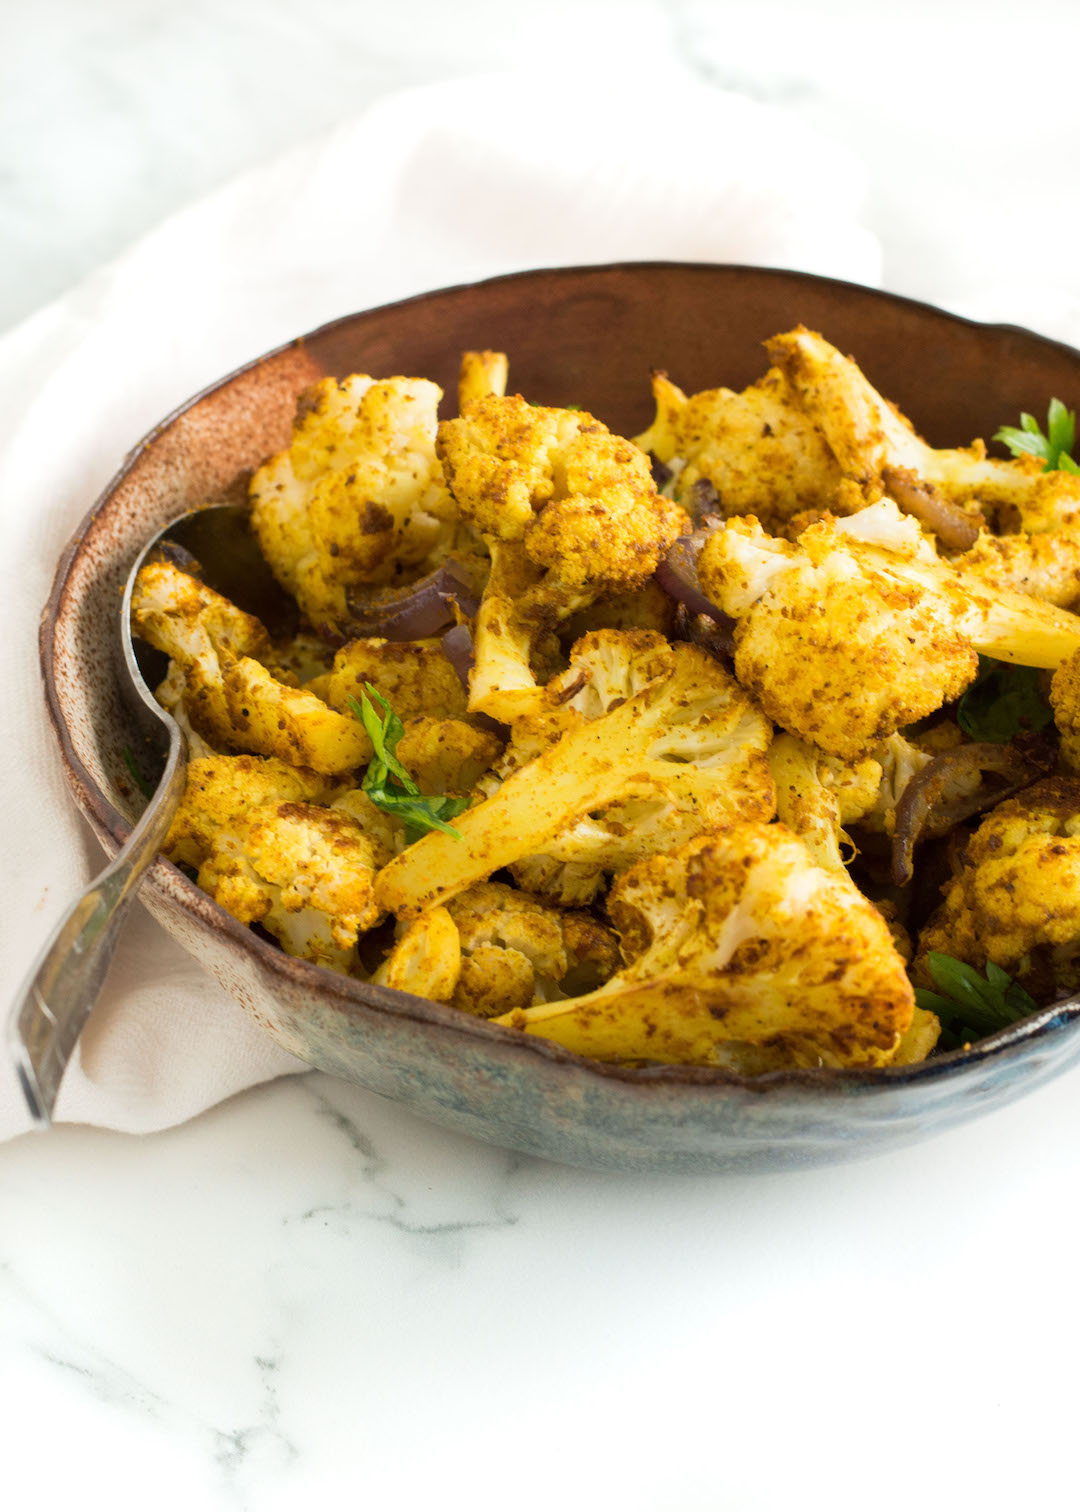 Easy Curried Roasted Cauliflower | side dish | recipe | cauliflower recipe | gluten free, vegan possible | easy to make